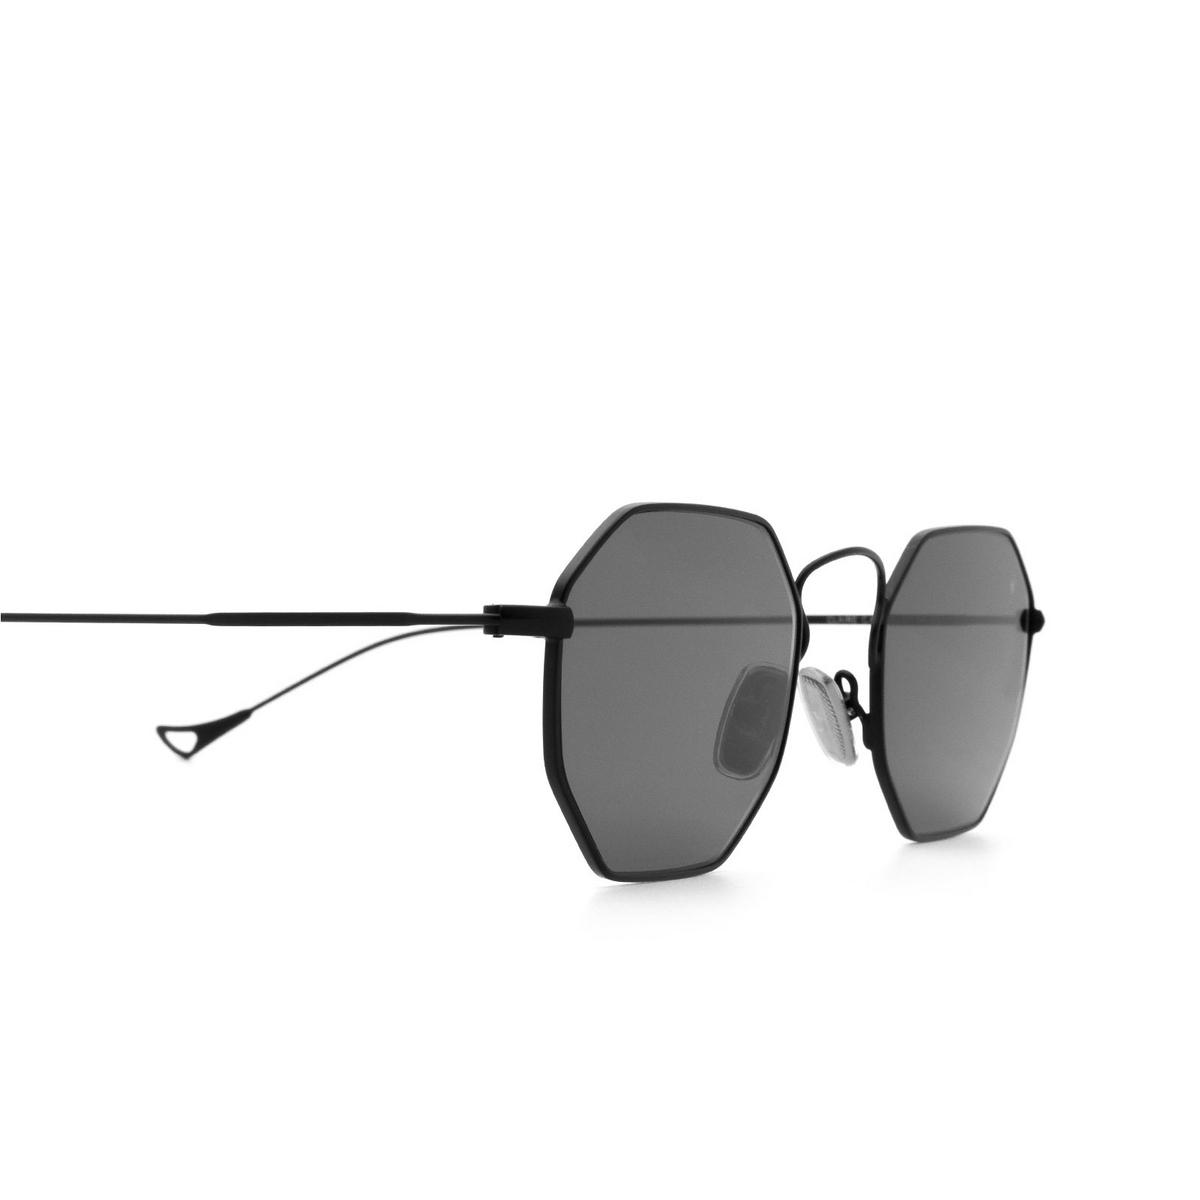 Eyepetizer® Irregular Sunglasses: Claire X Mia Burton color Black C.6-7 - 3/6.